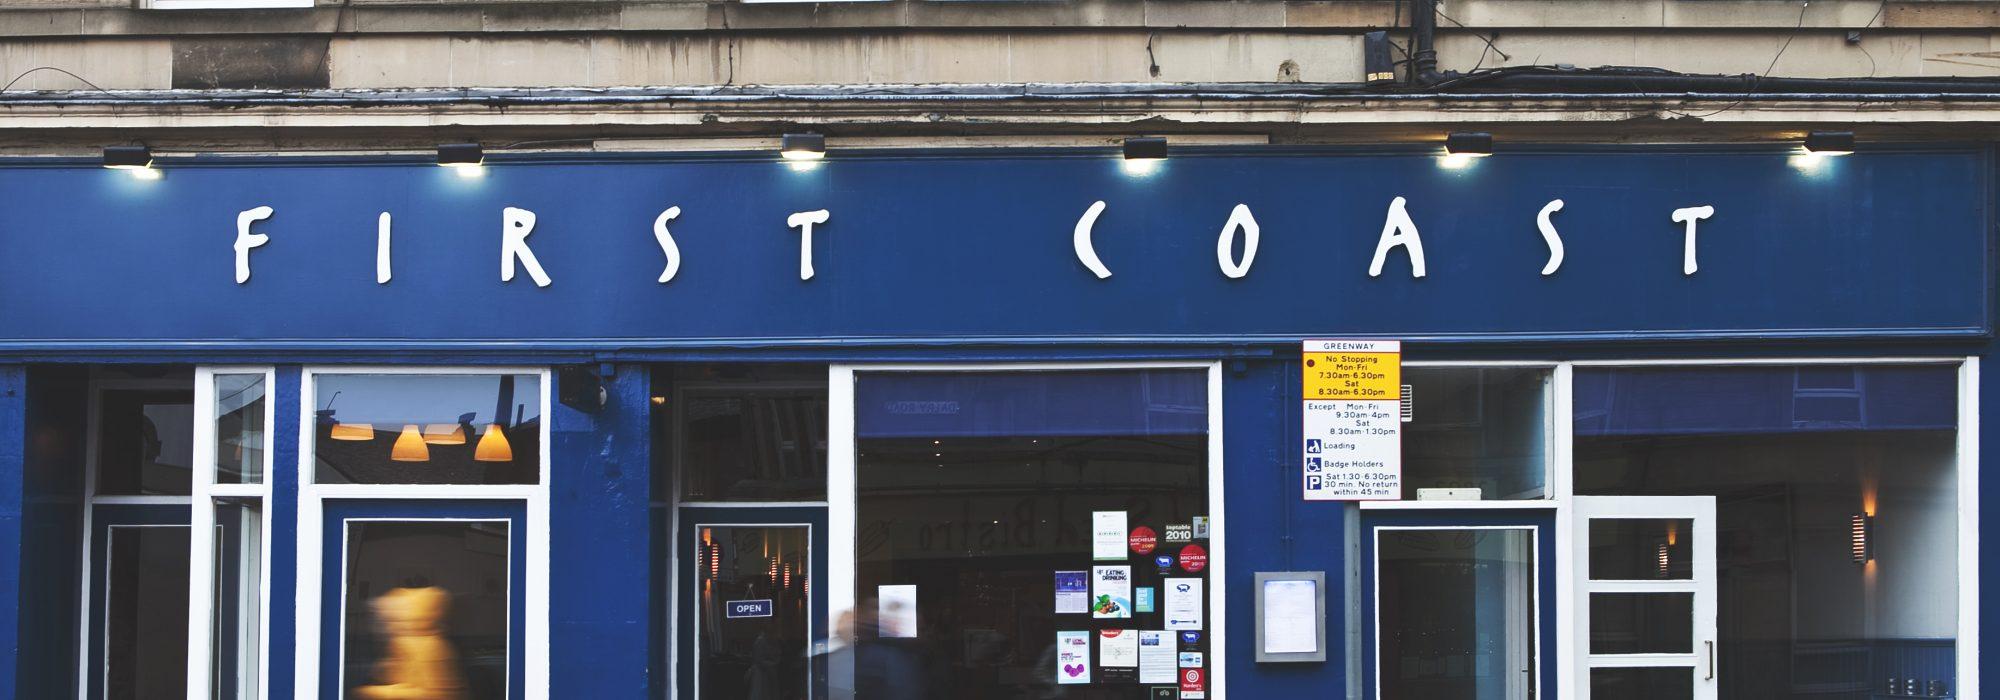 Front Restaurant